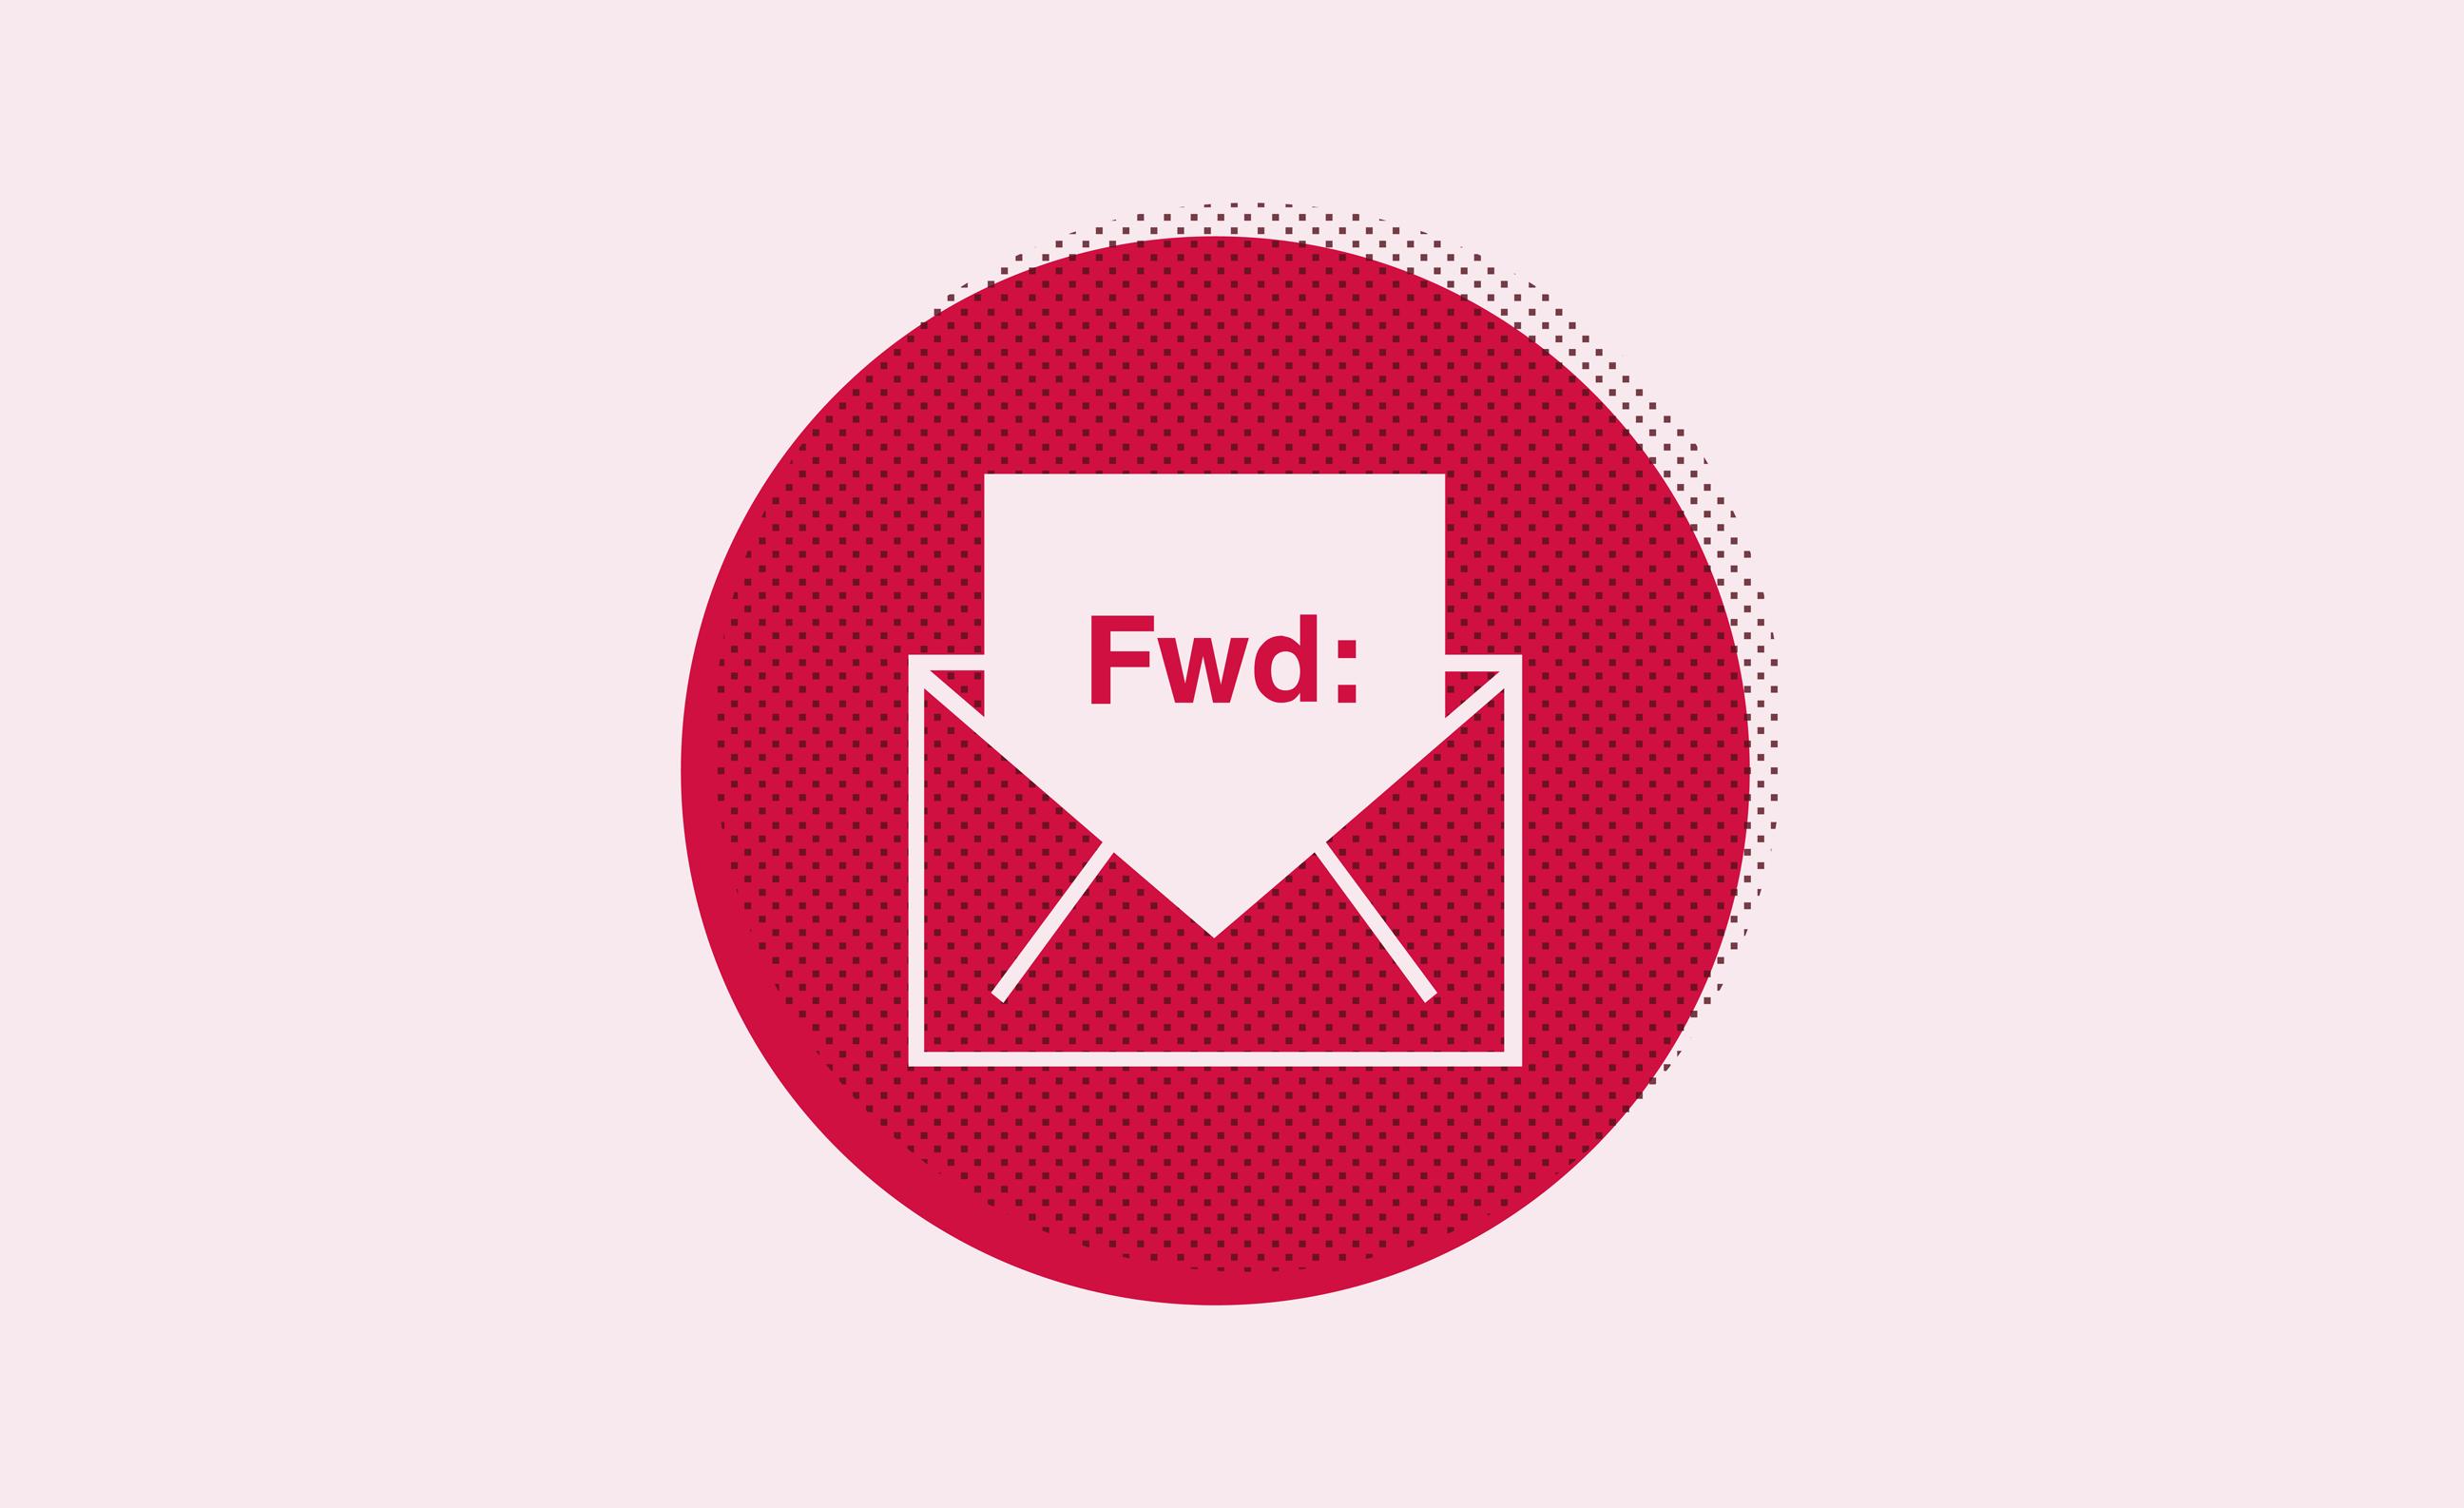 Fwd: Logo graphic